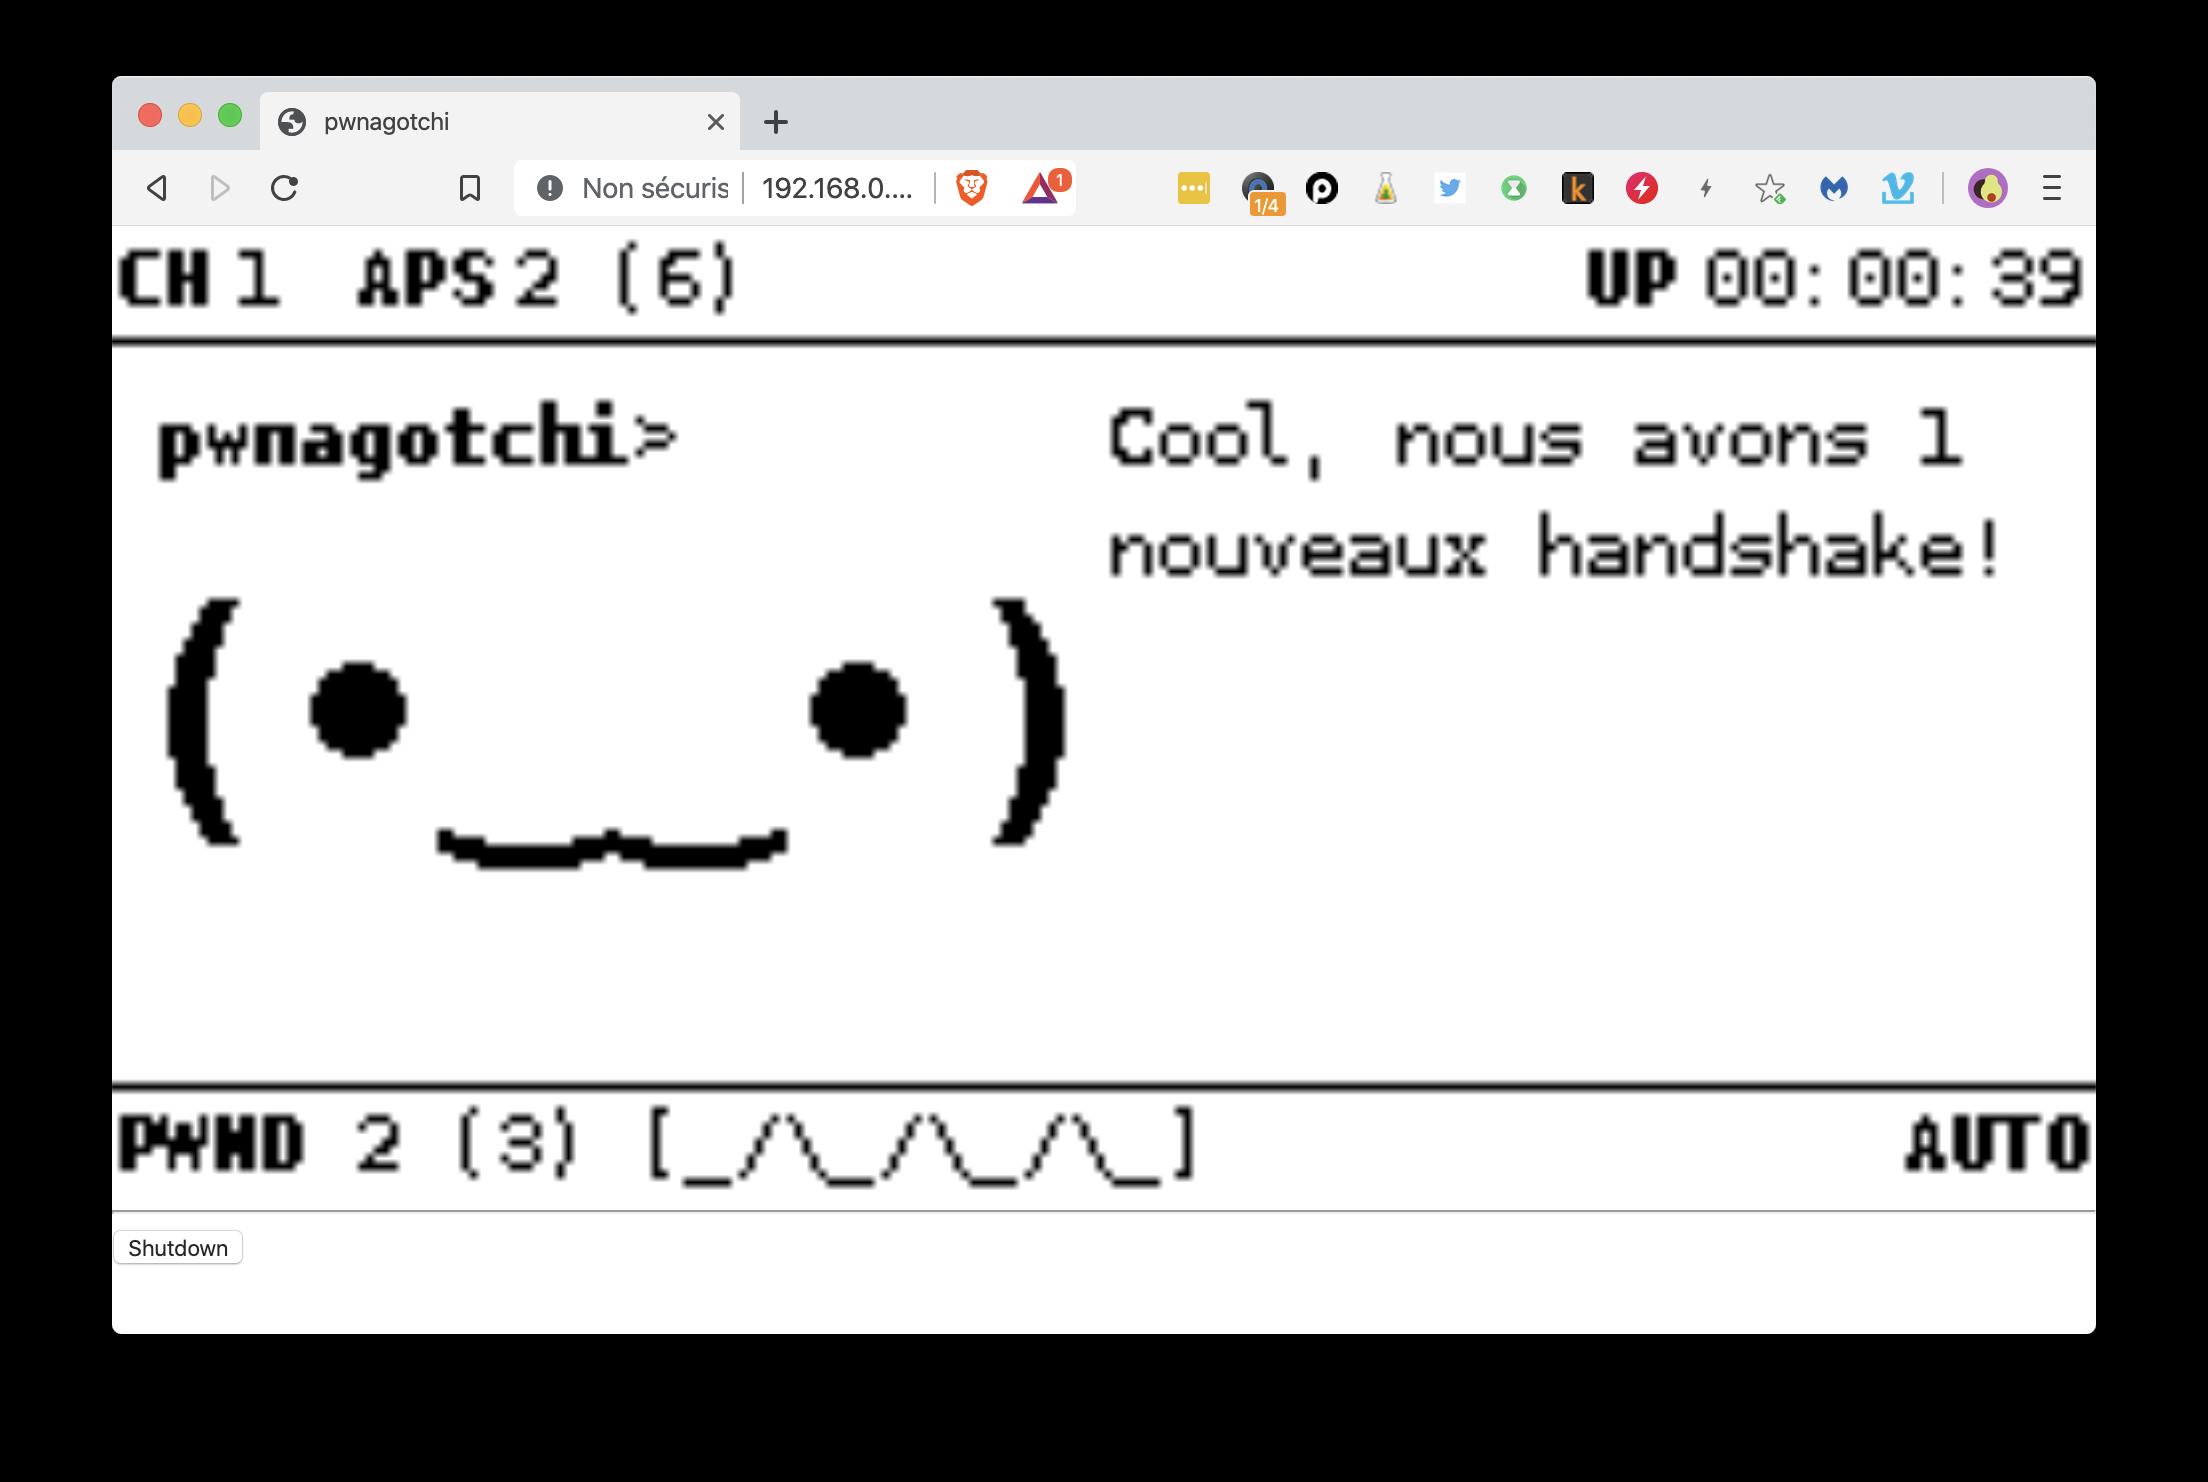 @Pwnagotchi – Pwnage wifi à base de deep learning sur Raspberry Pi